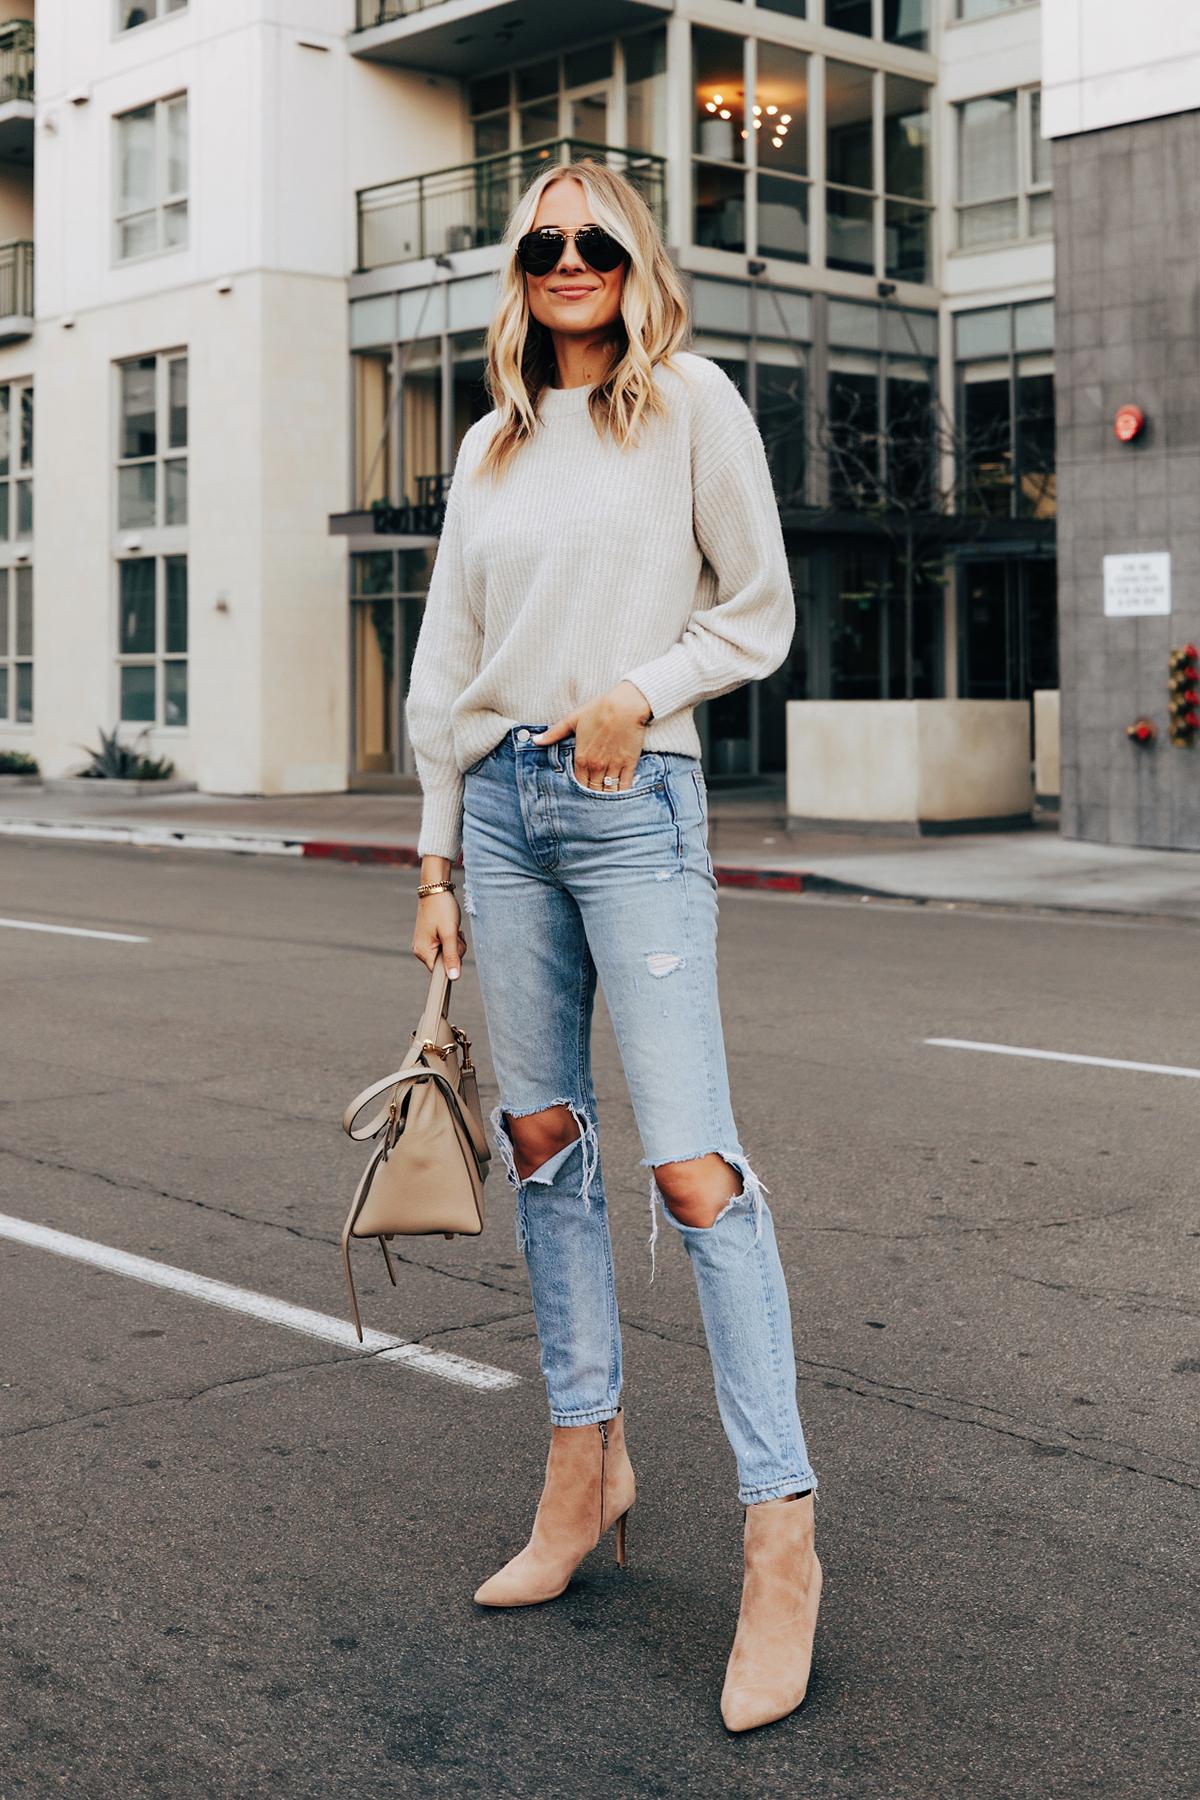 Fashion Jackson Wearing Everlane Beige Sweater Boyish Ripped Jeans Nine West Tan Suede Stiletto Booties